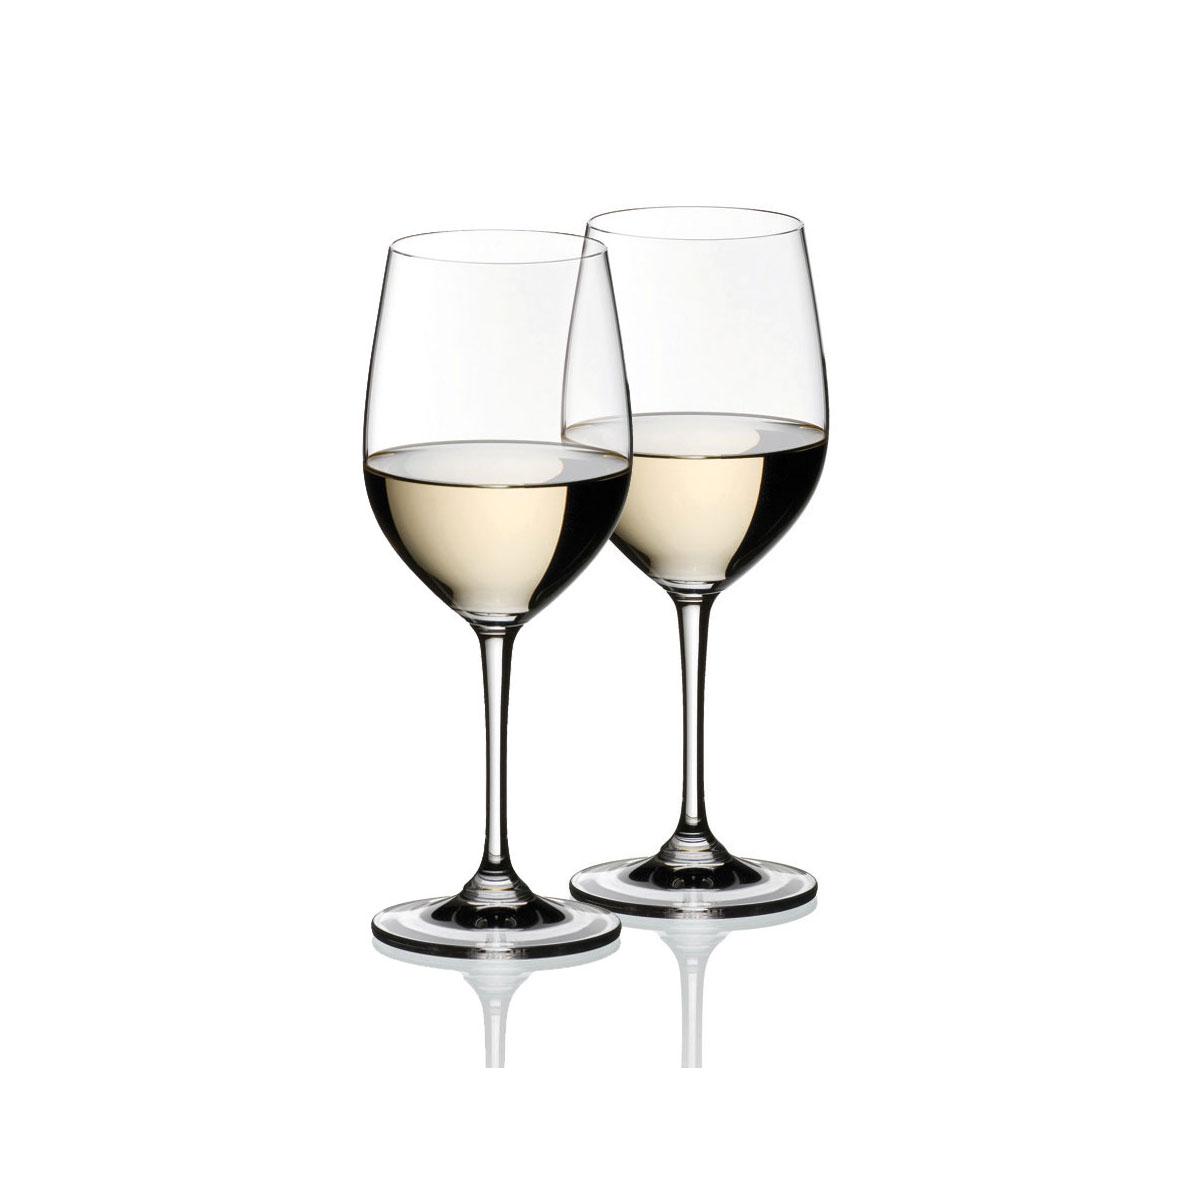 Riedel Vinum, Chablis Chardonnay Wine Glasses, Set of 6+2 Free